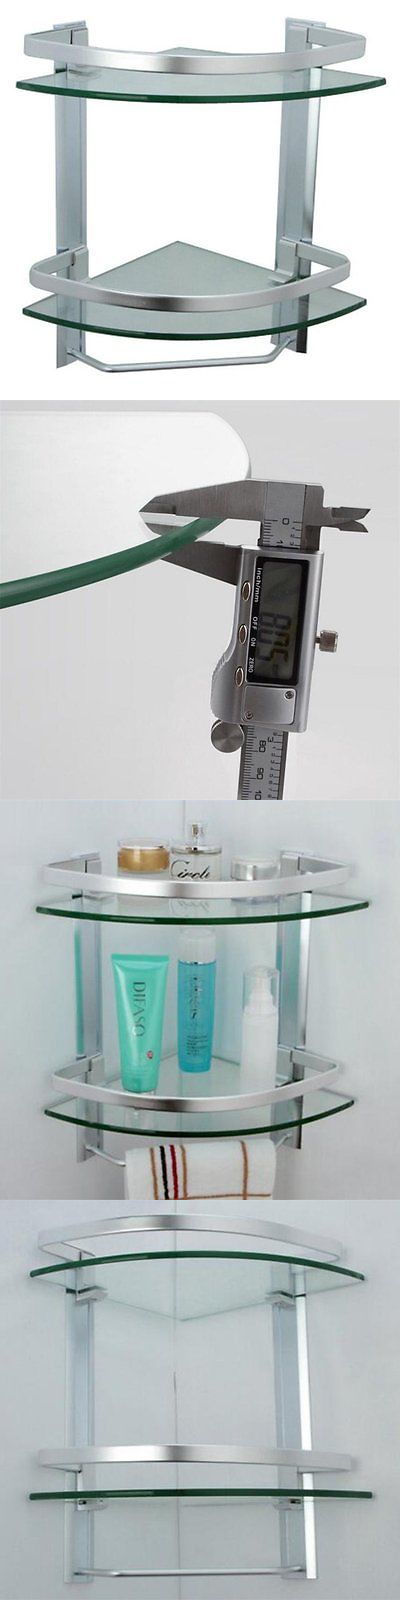 Shelves 31385 Homeself Triangular Aluminum Bathroom Glass Corner